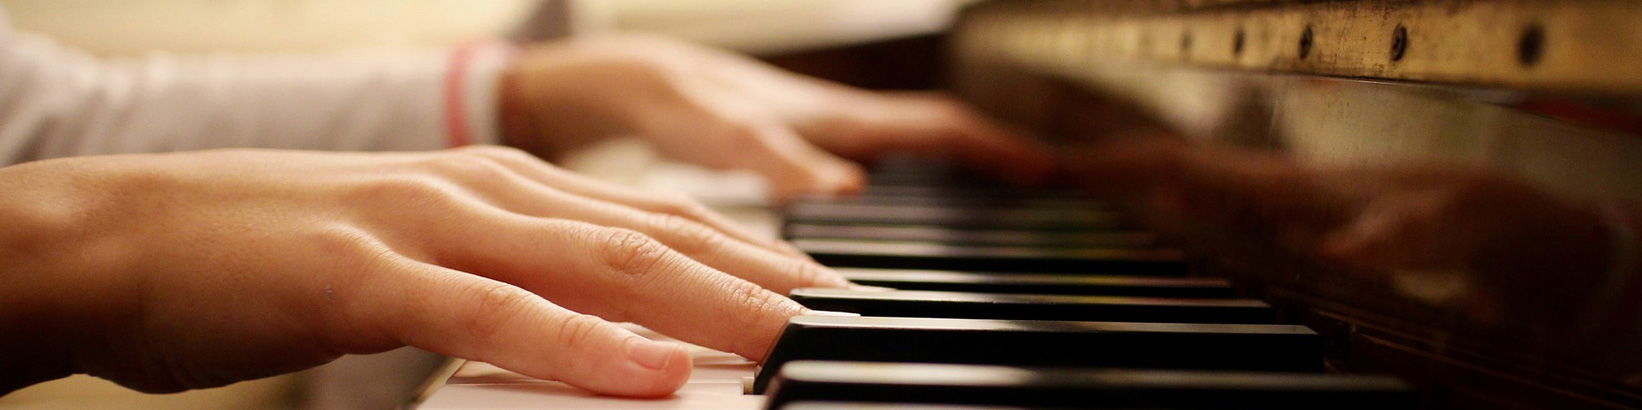 Bild Klavierspieler/in